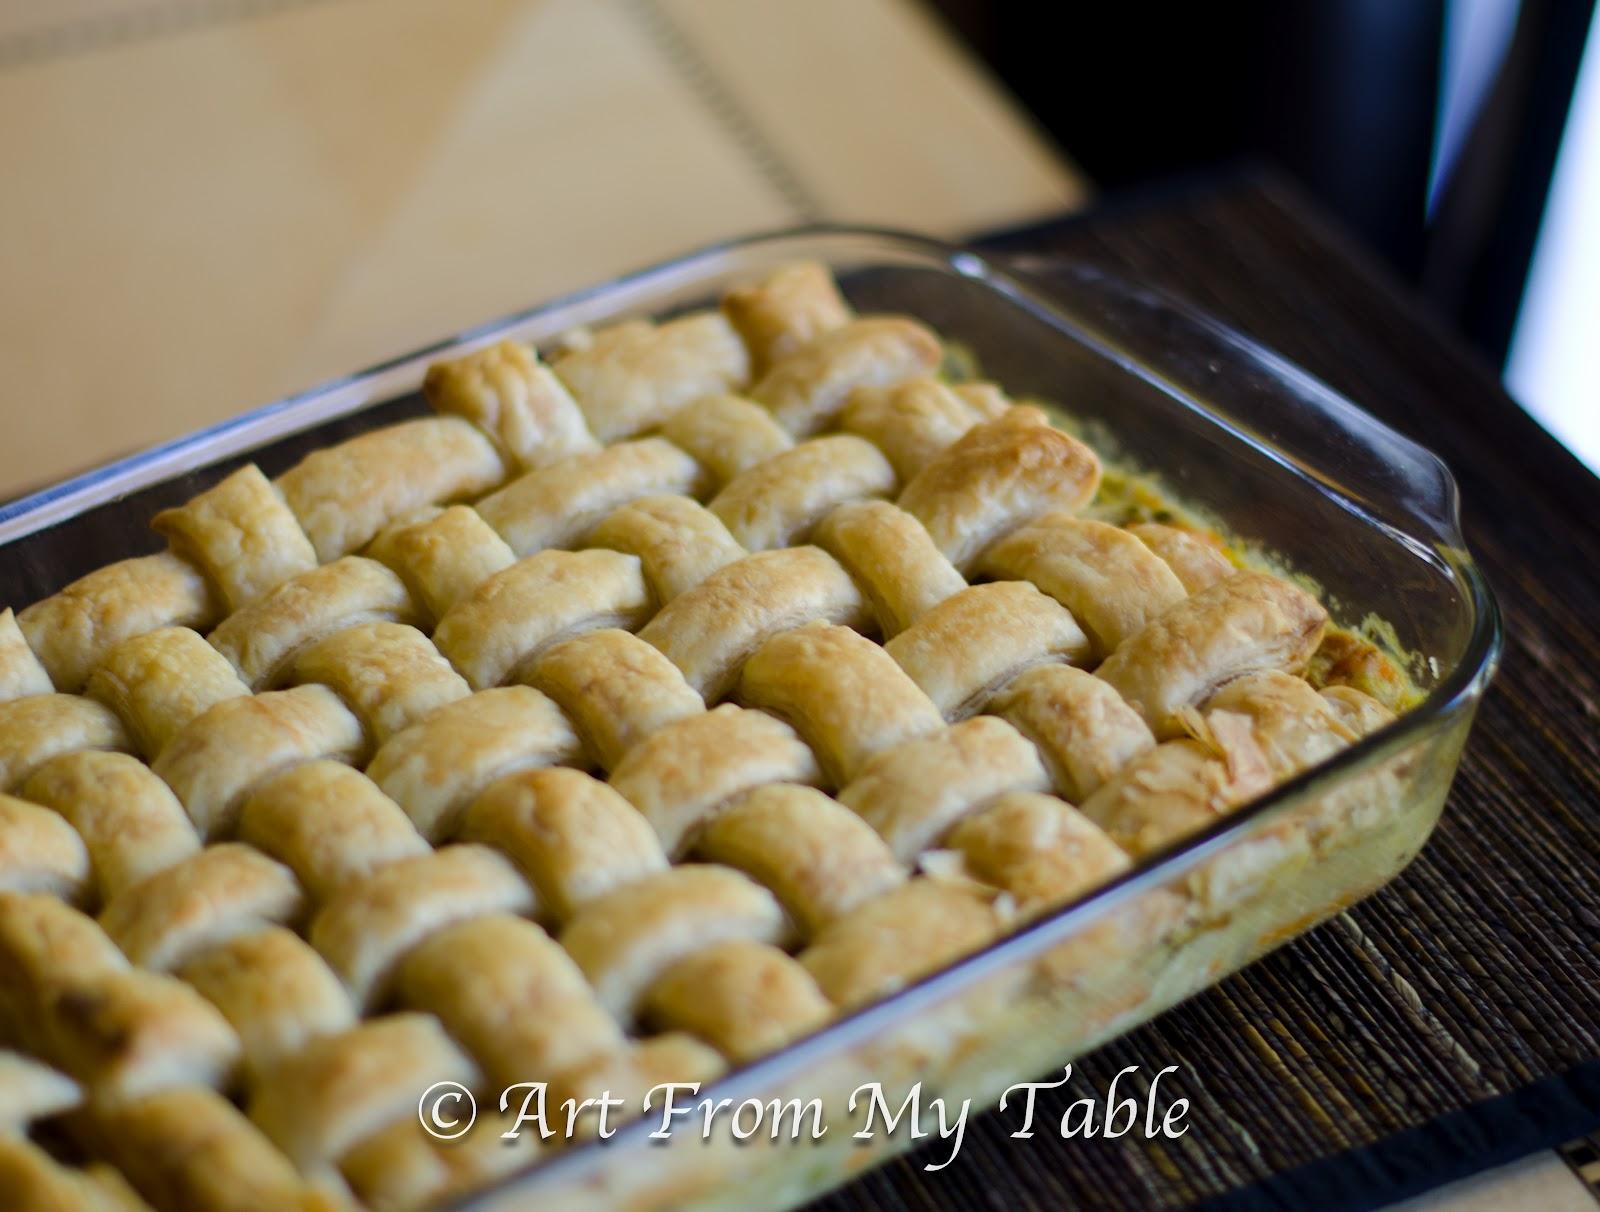 Art From My Table: Chicken Pot Pie Casserole With Sweet Potato & Apple